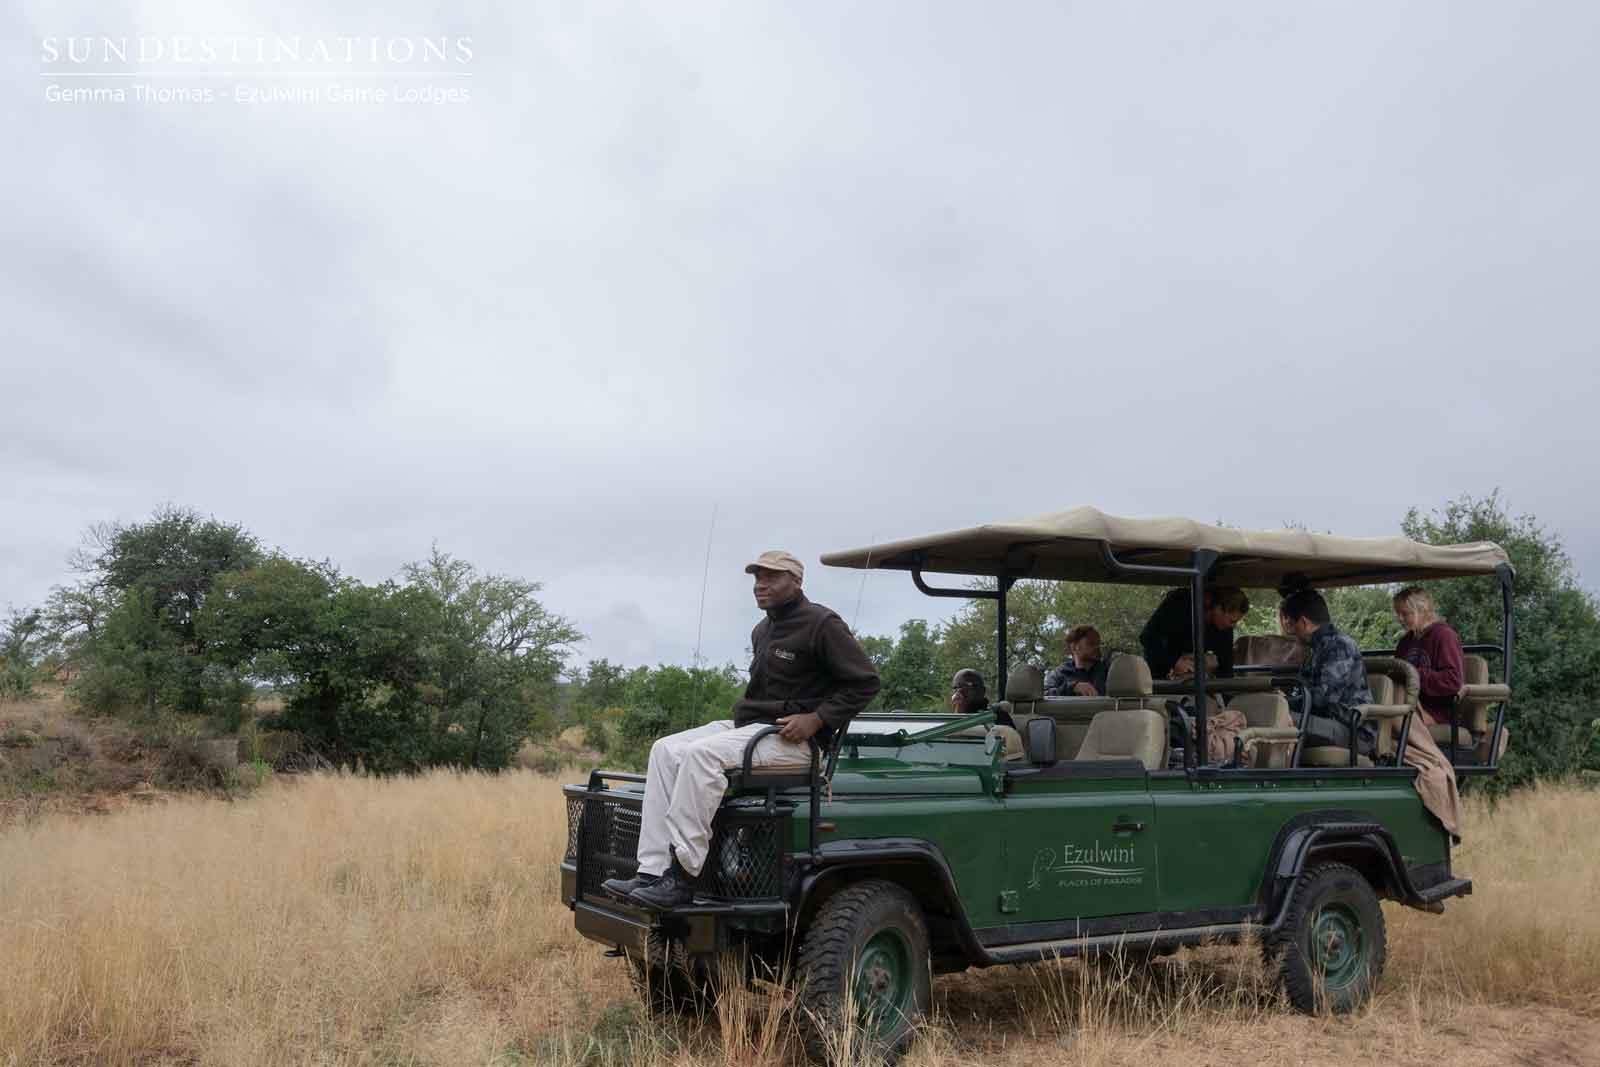 Ezulwini Guides in the Bushveld